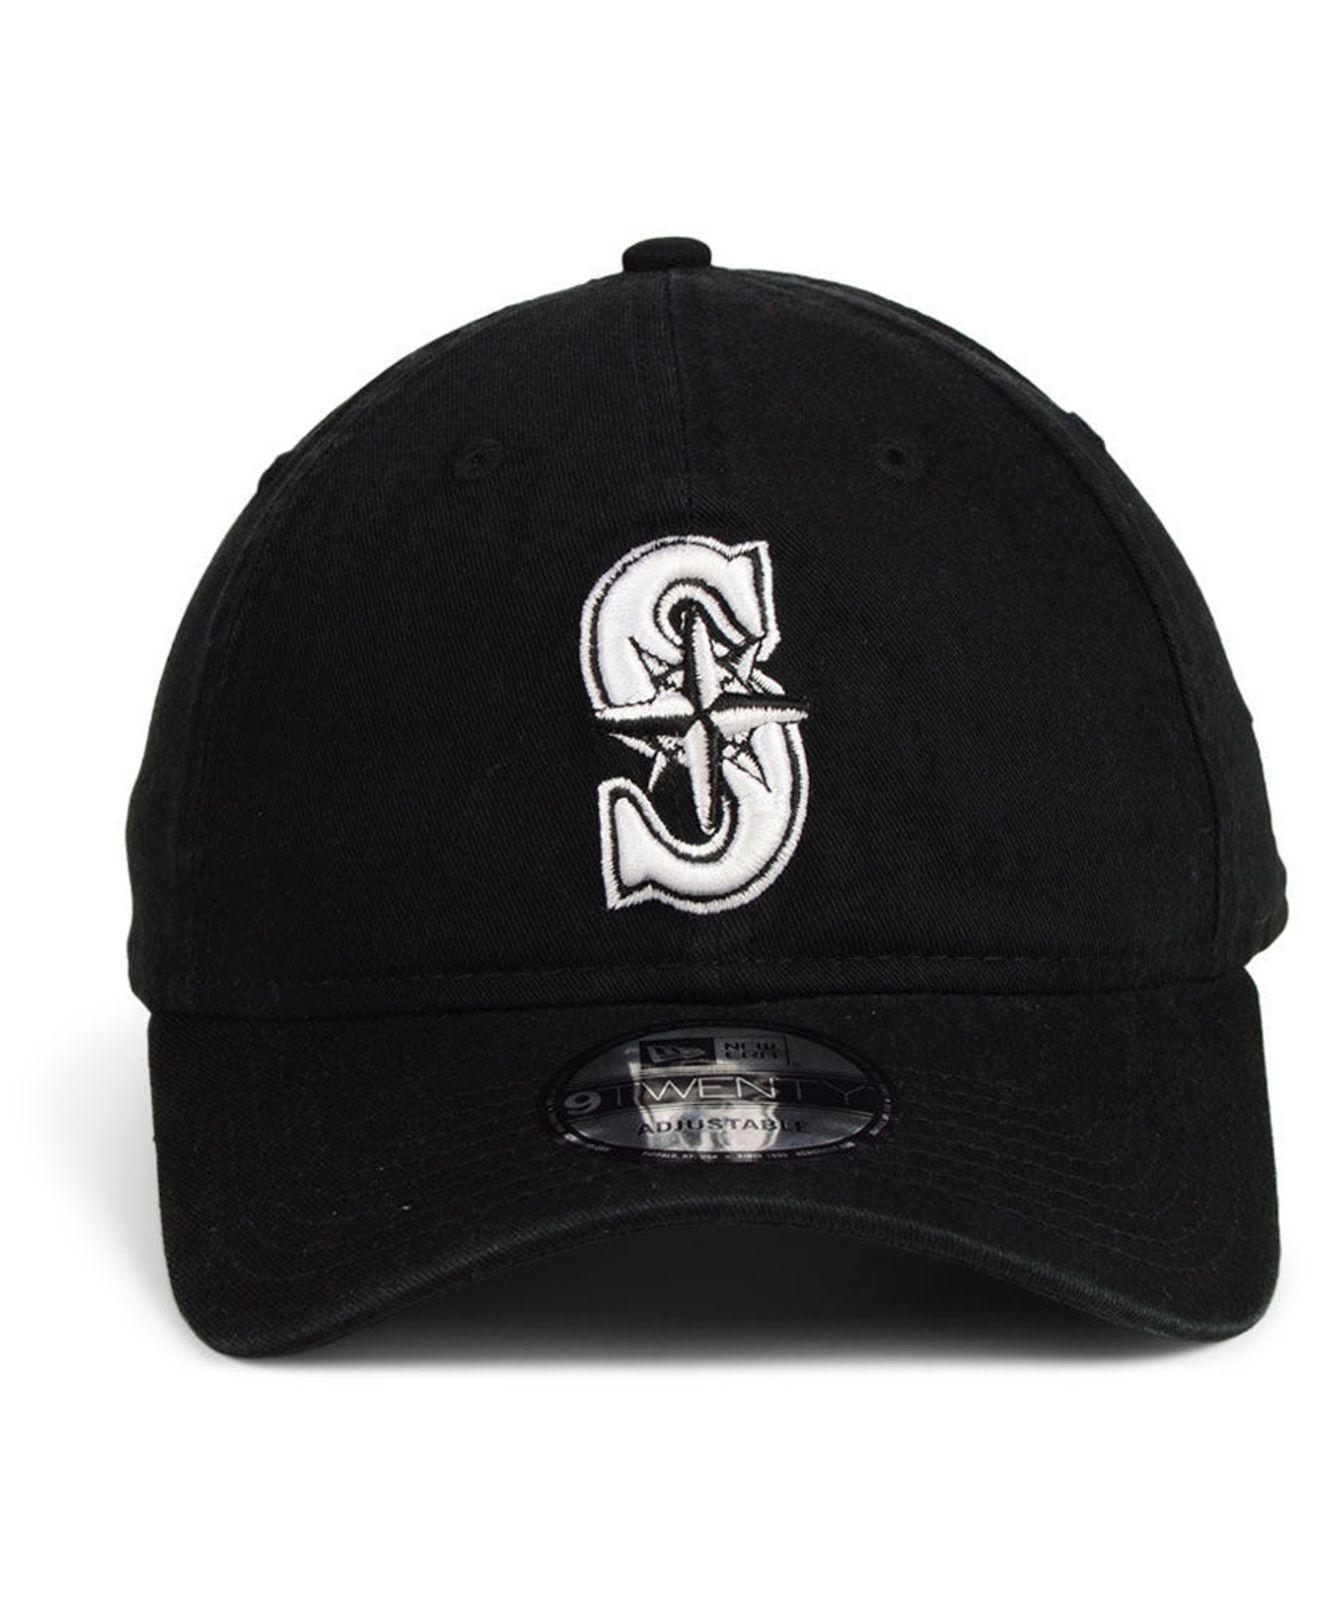 low priced 14ede dc691 Lyst - KTZ Seattle Mariners Core 9twenty Strapback Cap in Black for Men